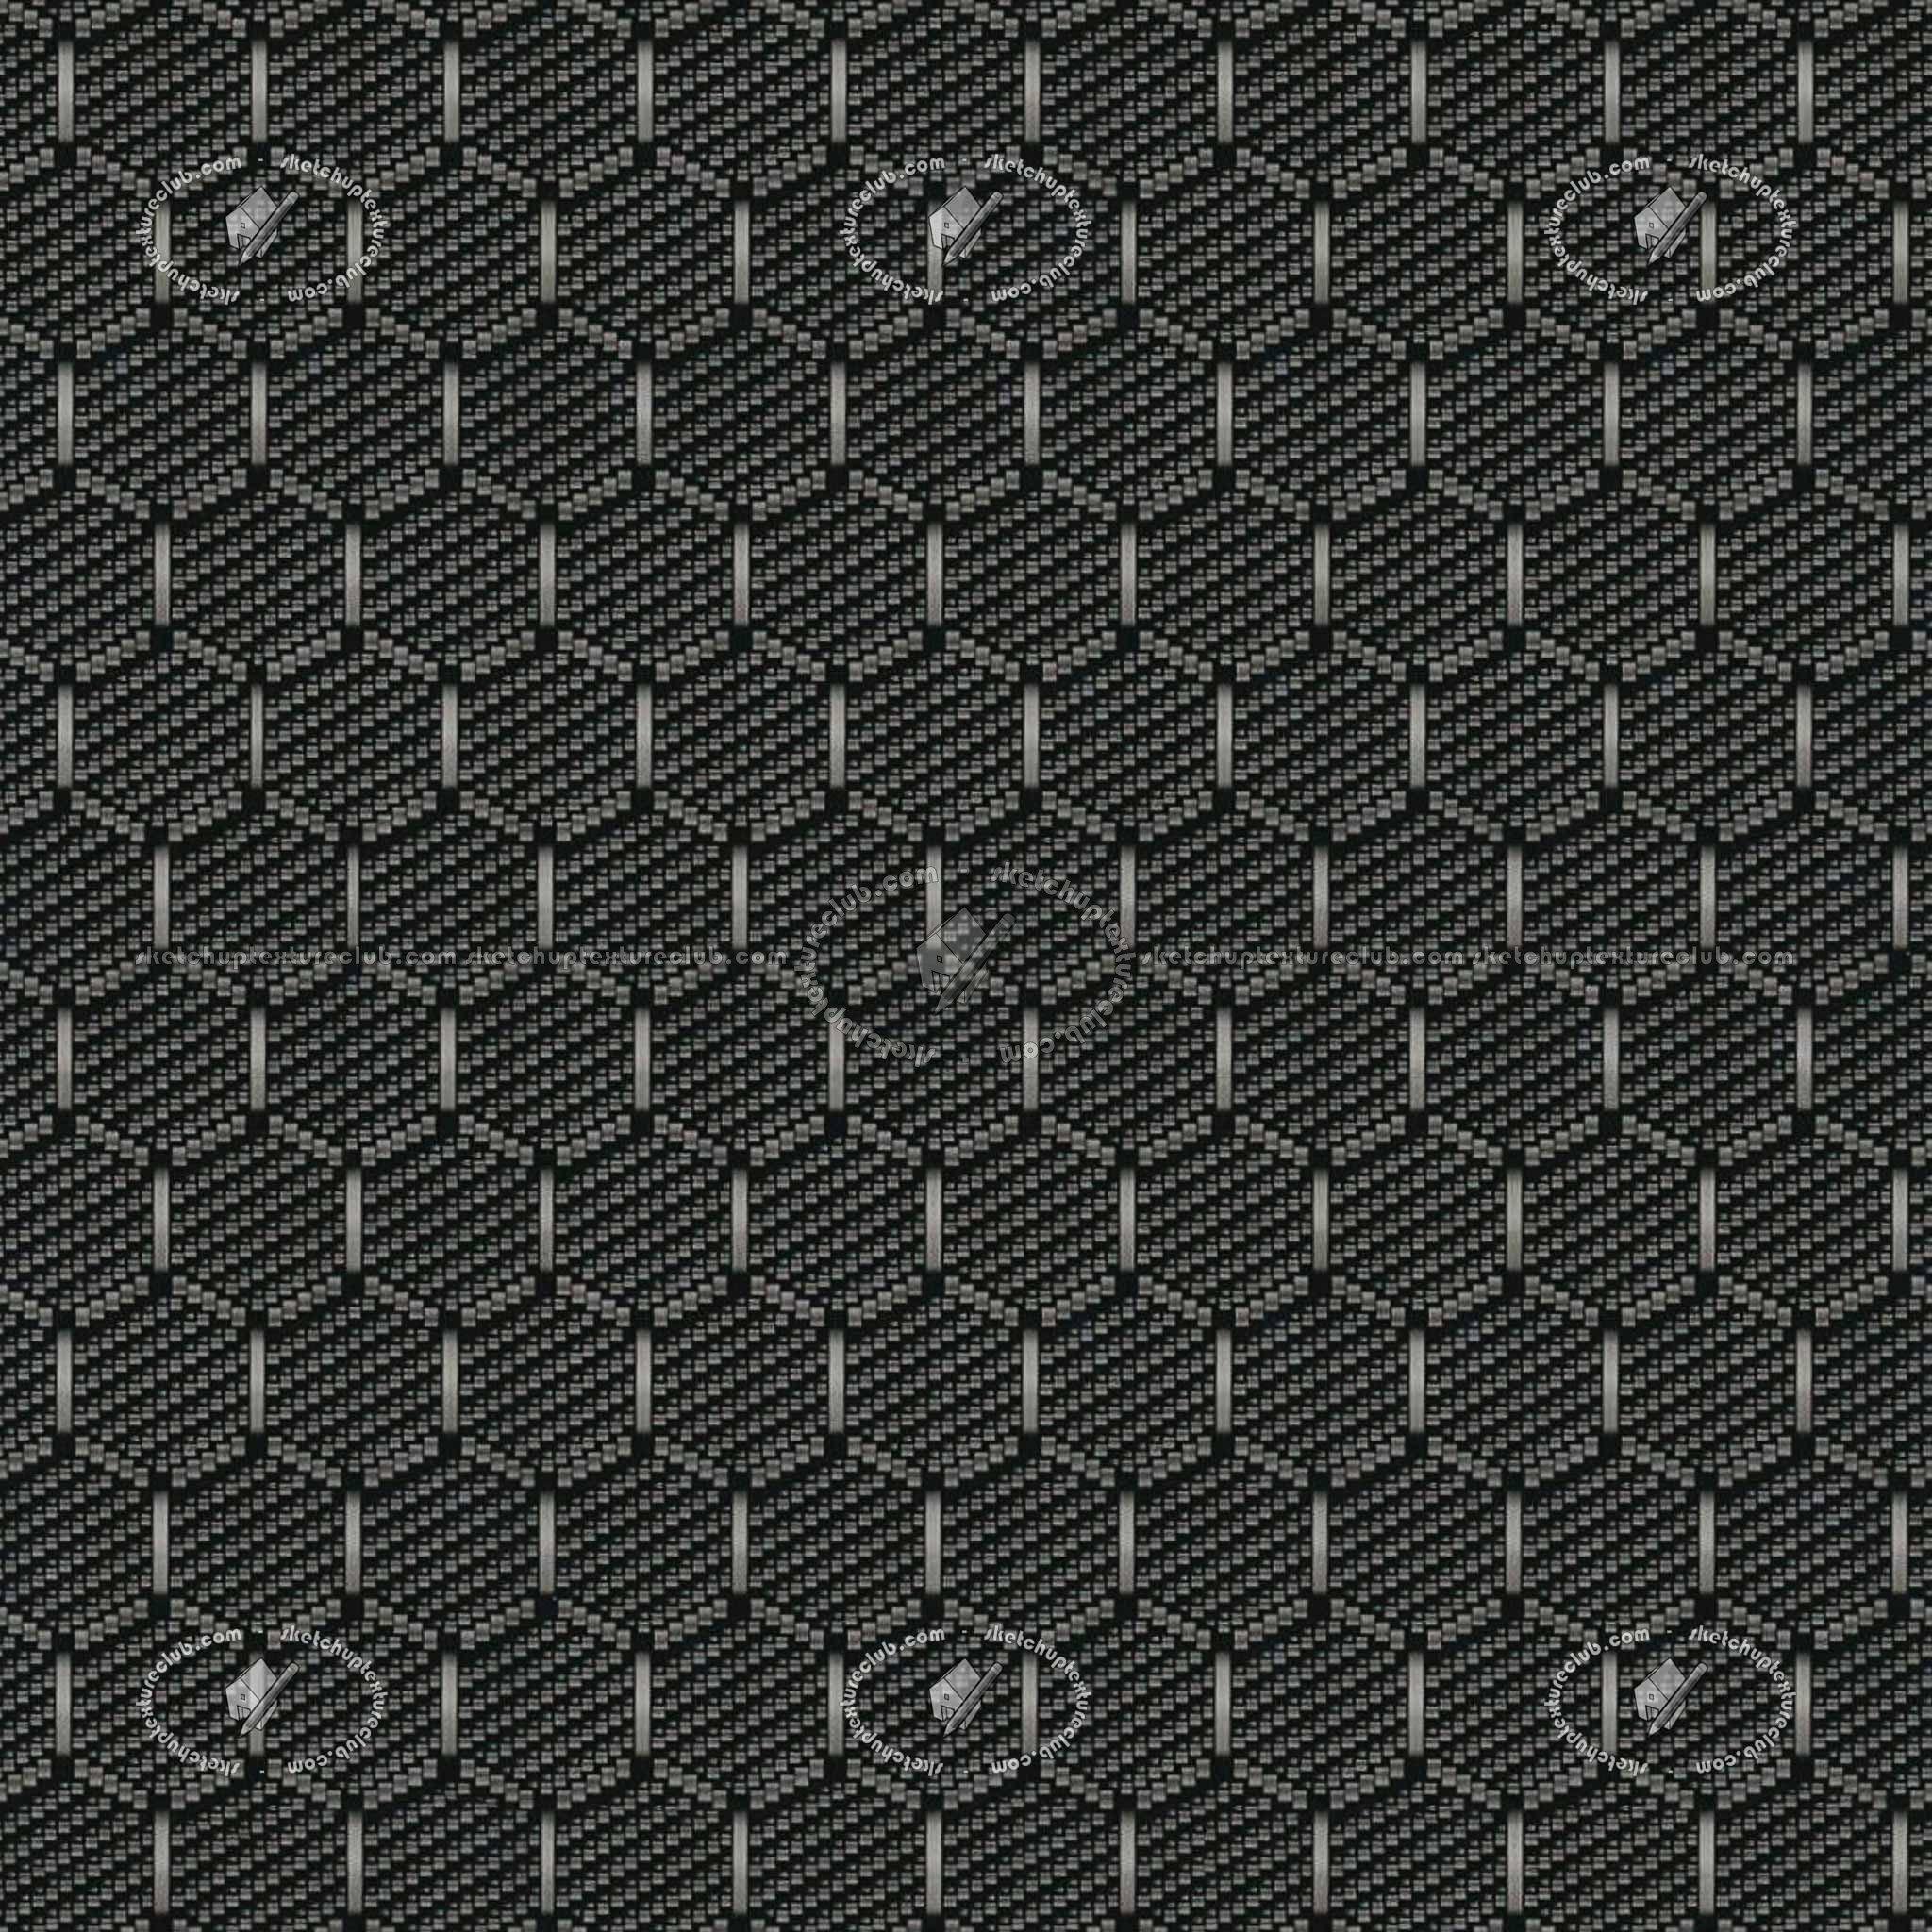 Carbon Fiber Texture Seamless Carbon Fiber Texture Seamless